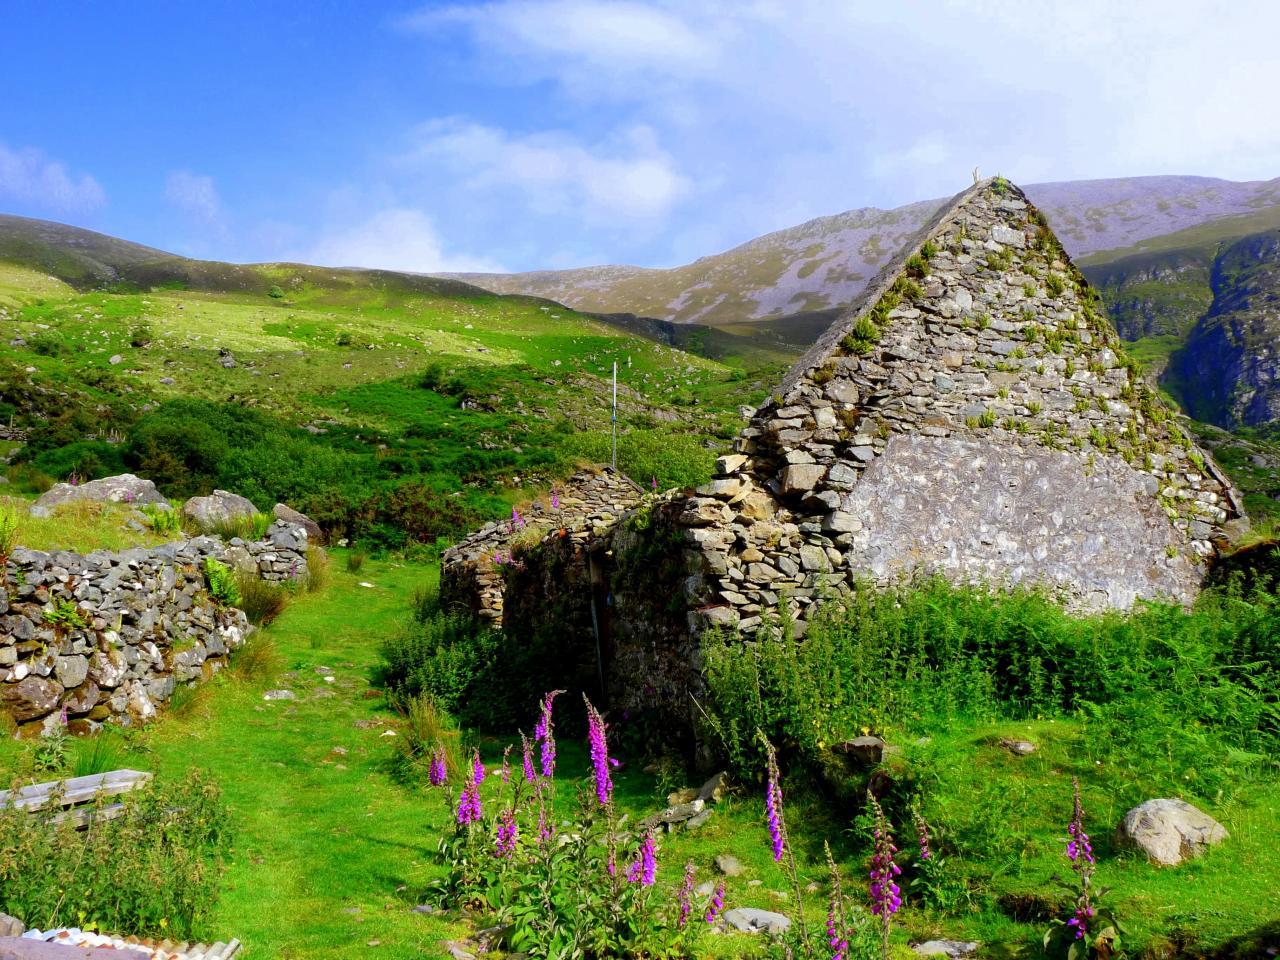 Ireland Scenery Wallpapers   Top Ireland Scenery Backgrounds 1280x960